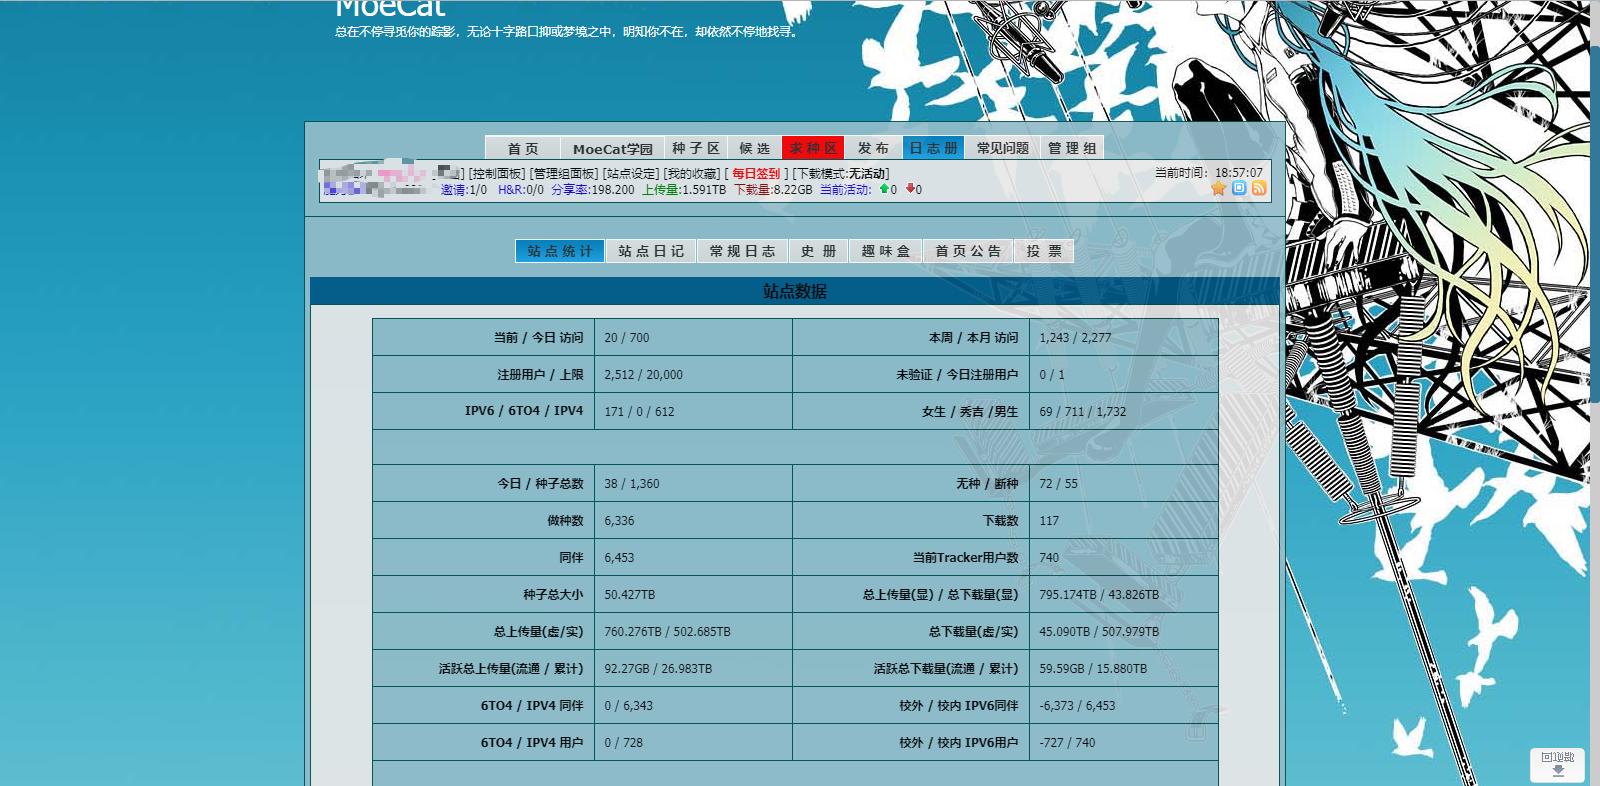 【MoeCat】萌猫开放注册(3月29日0时至3月31日24时)